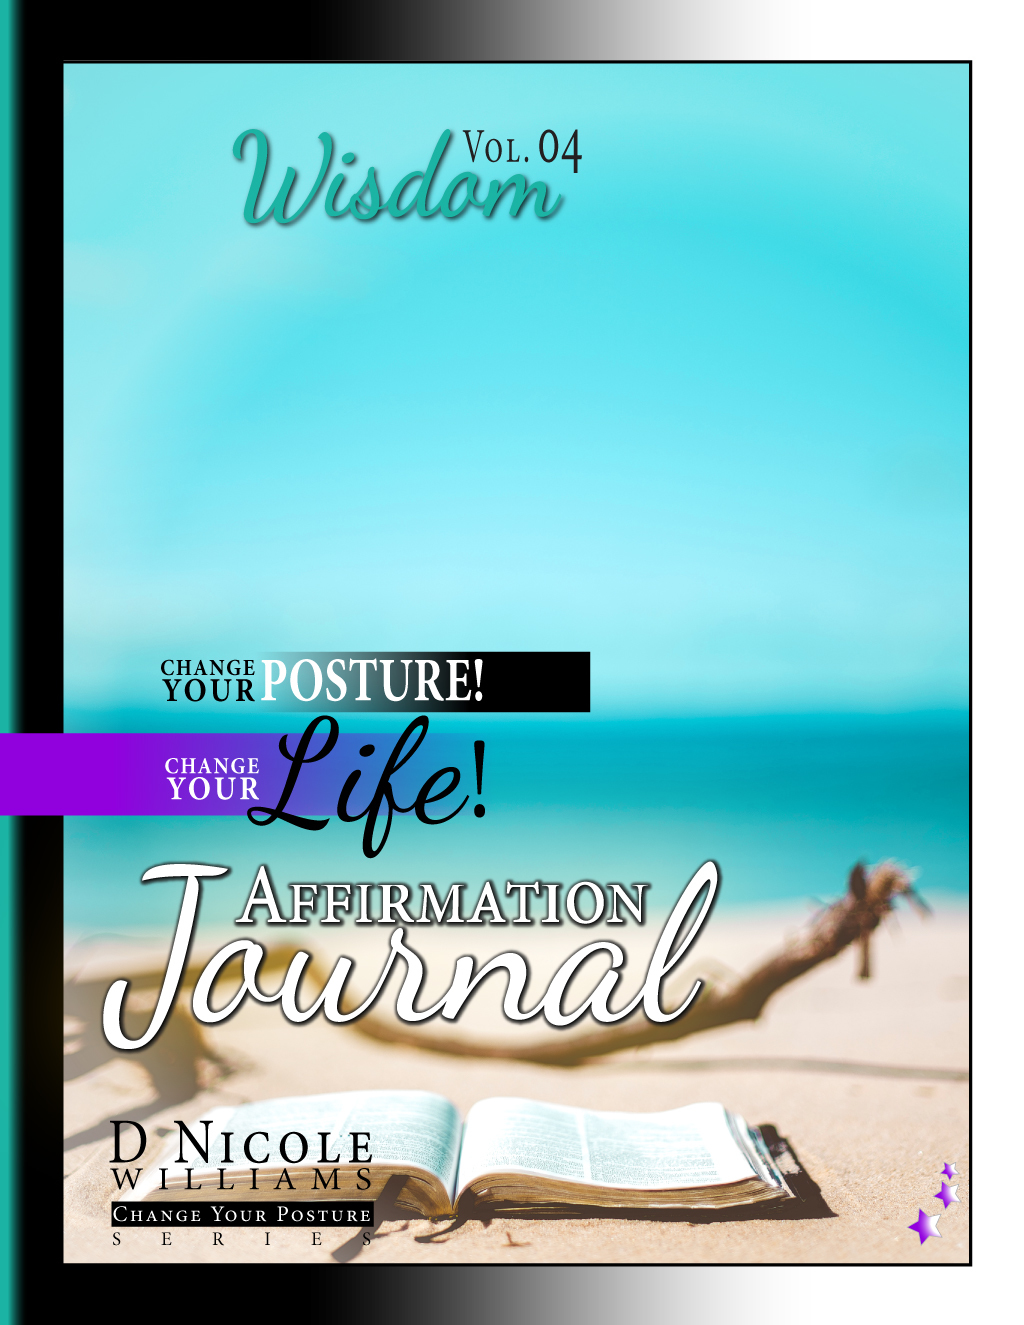 Change Your Posture! Change Your Life! Affirmation Journal Vol. 4: Wisdom